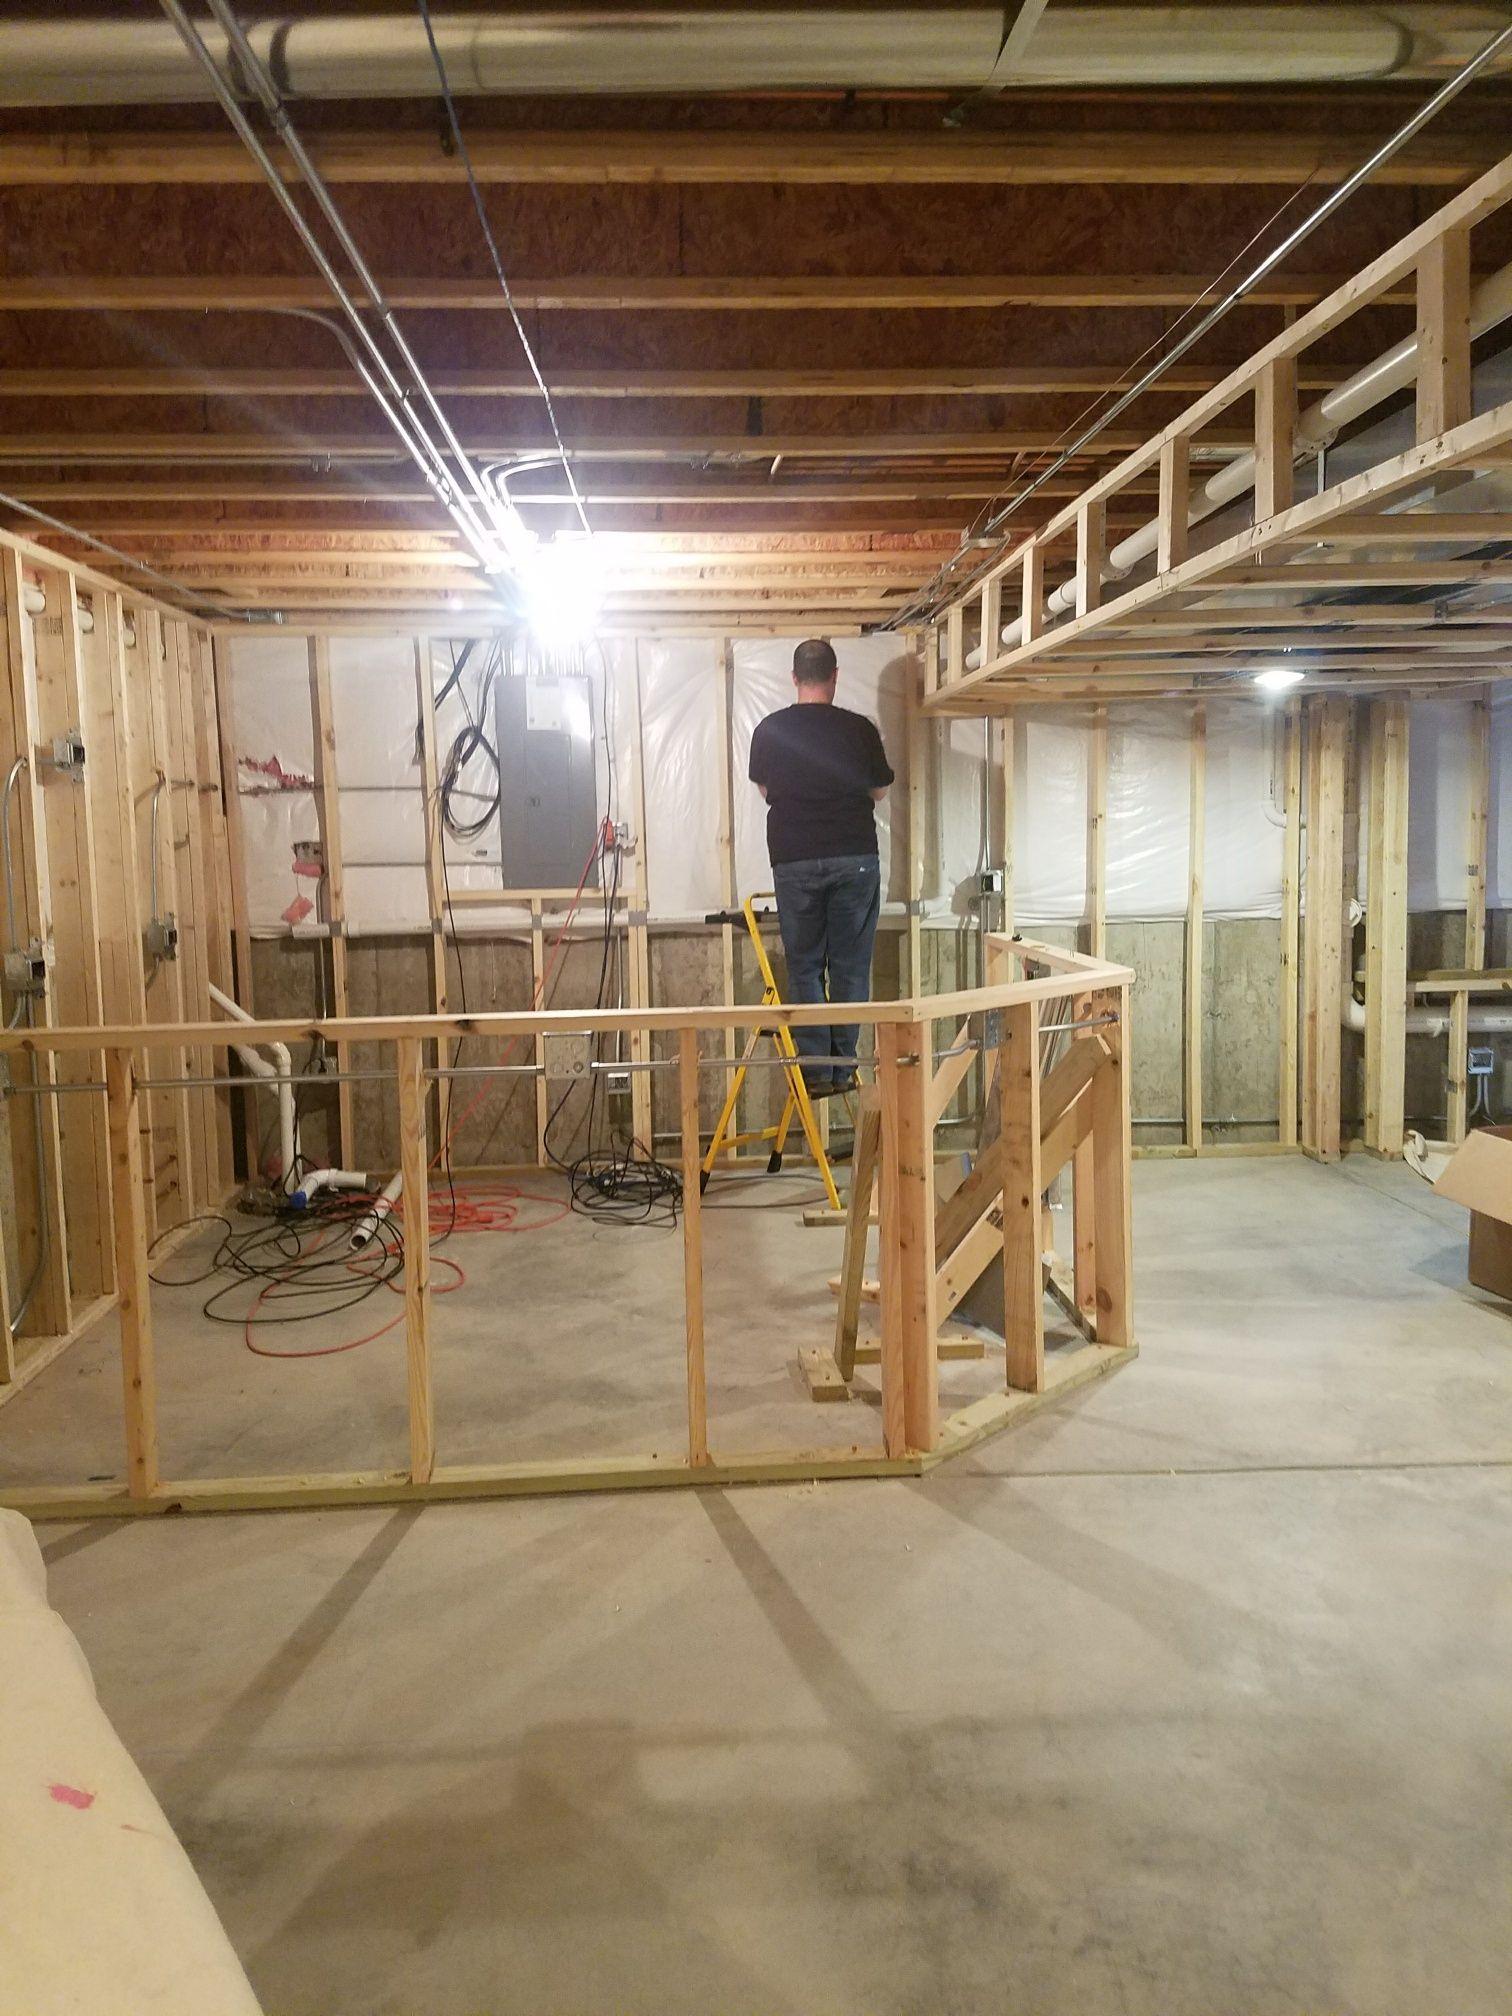 Basement bar framing | Finished Basement Project | Pinterest ...